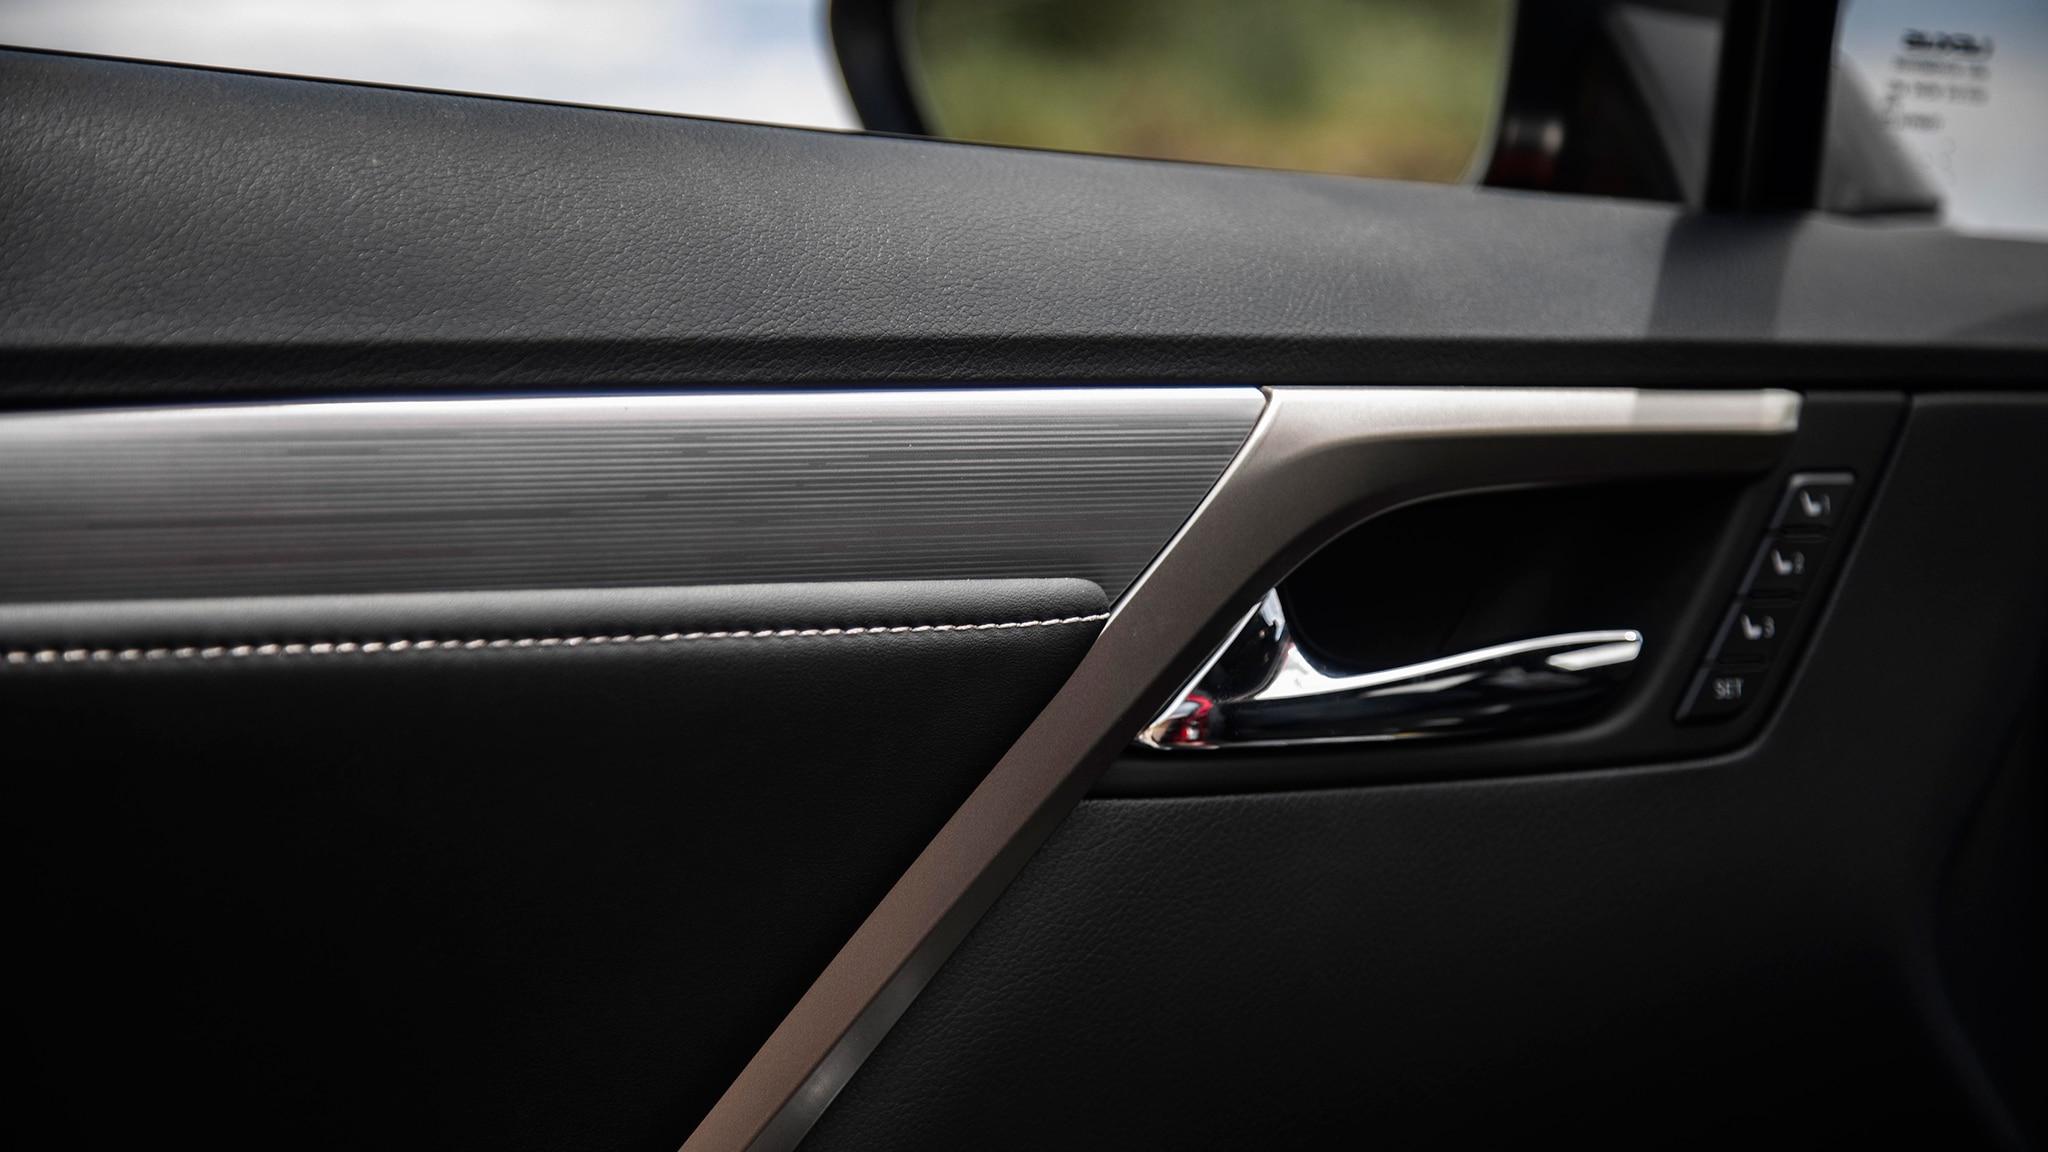 2020 Lexus RX 350 14 - Motor Trend en Español